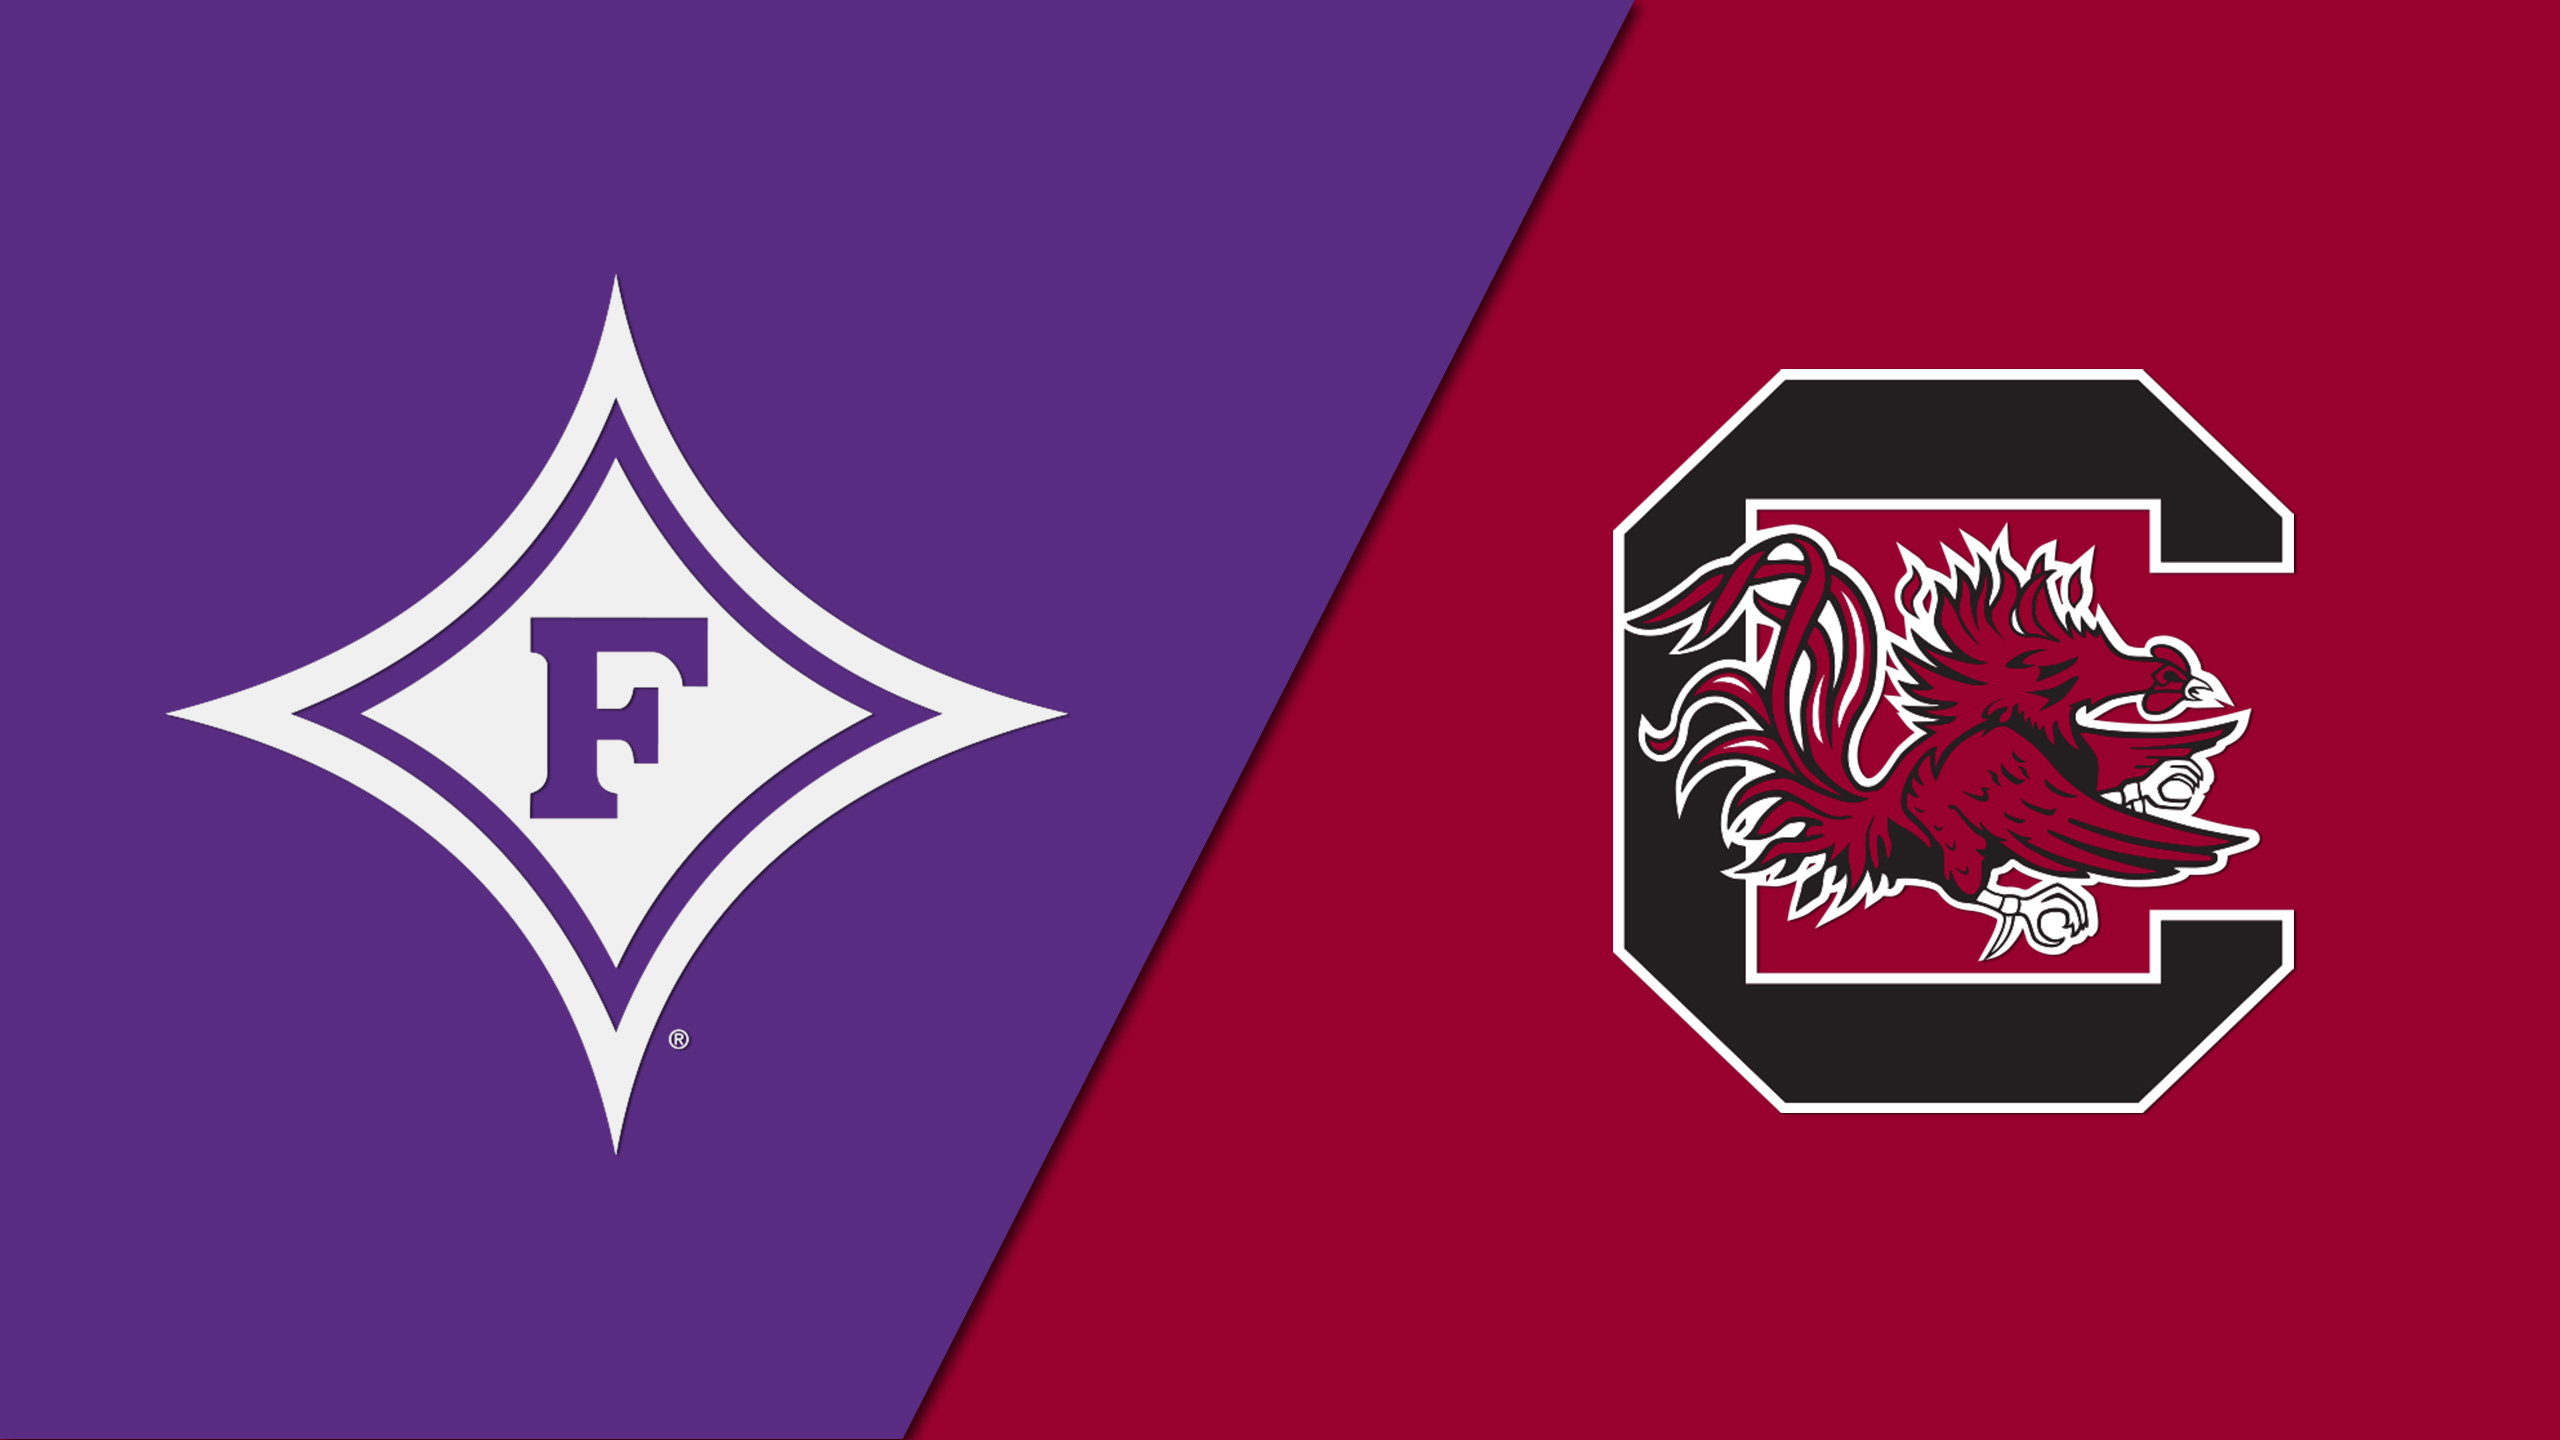 Furman vs. #25 South Carolina (W Basketball)